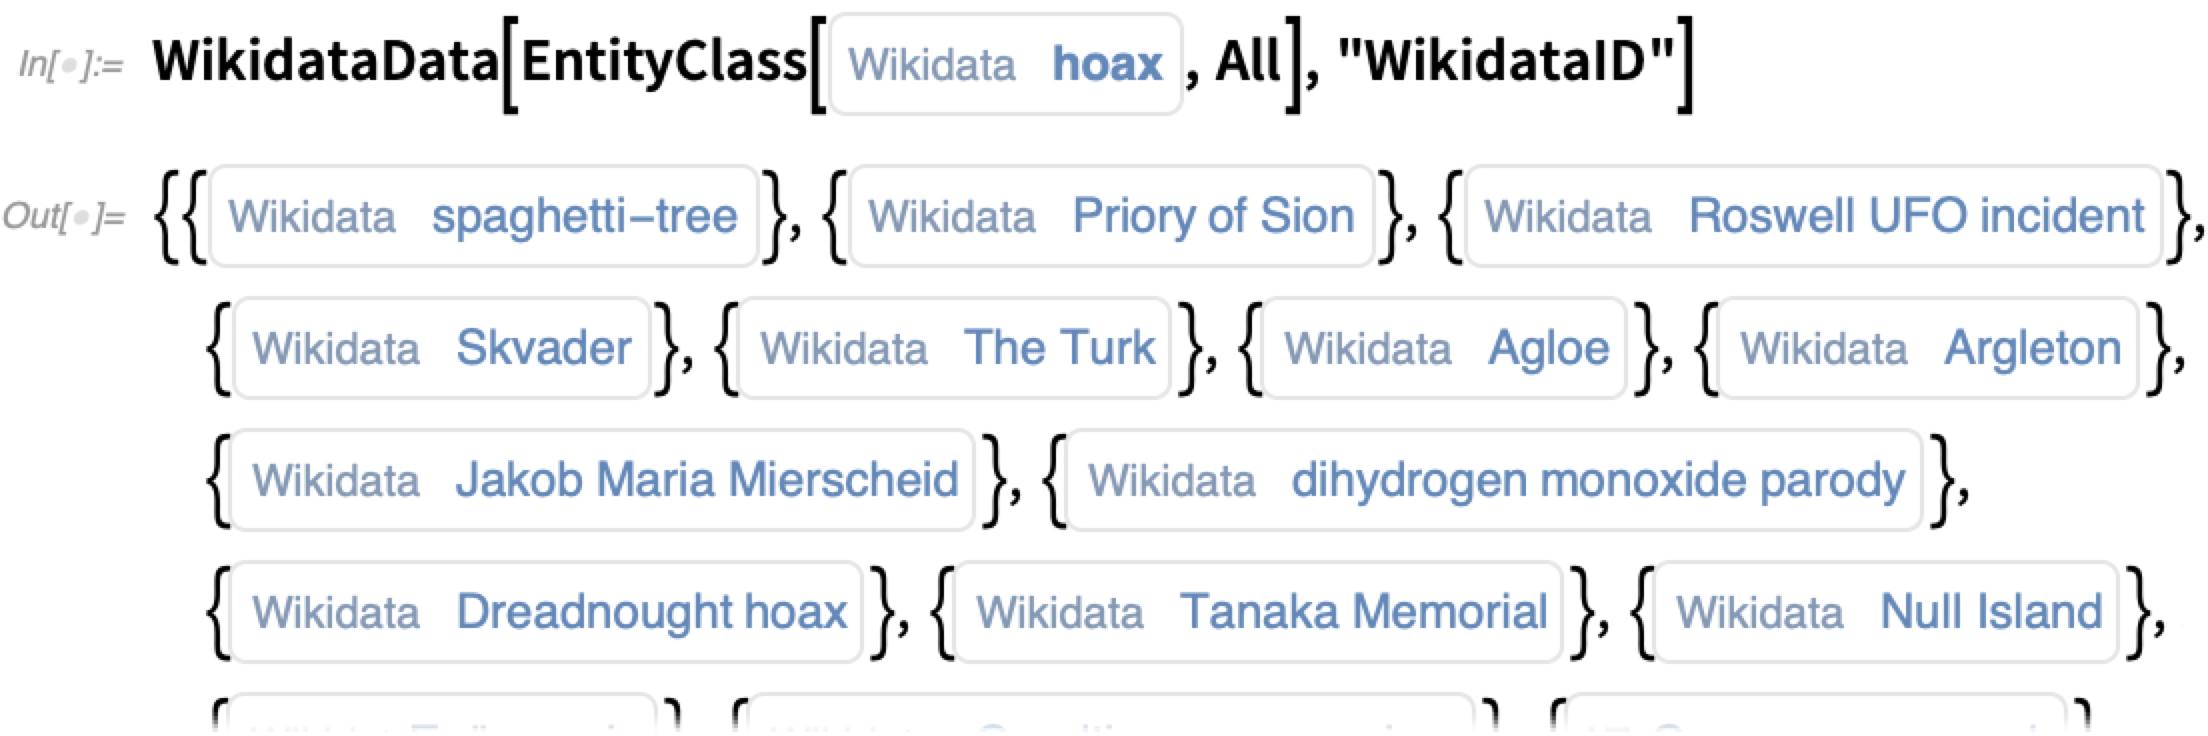 WikidataData